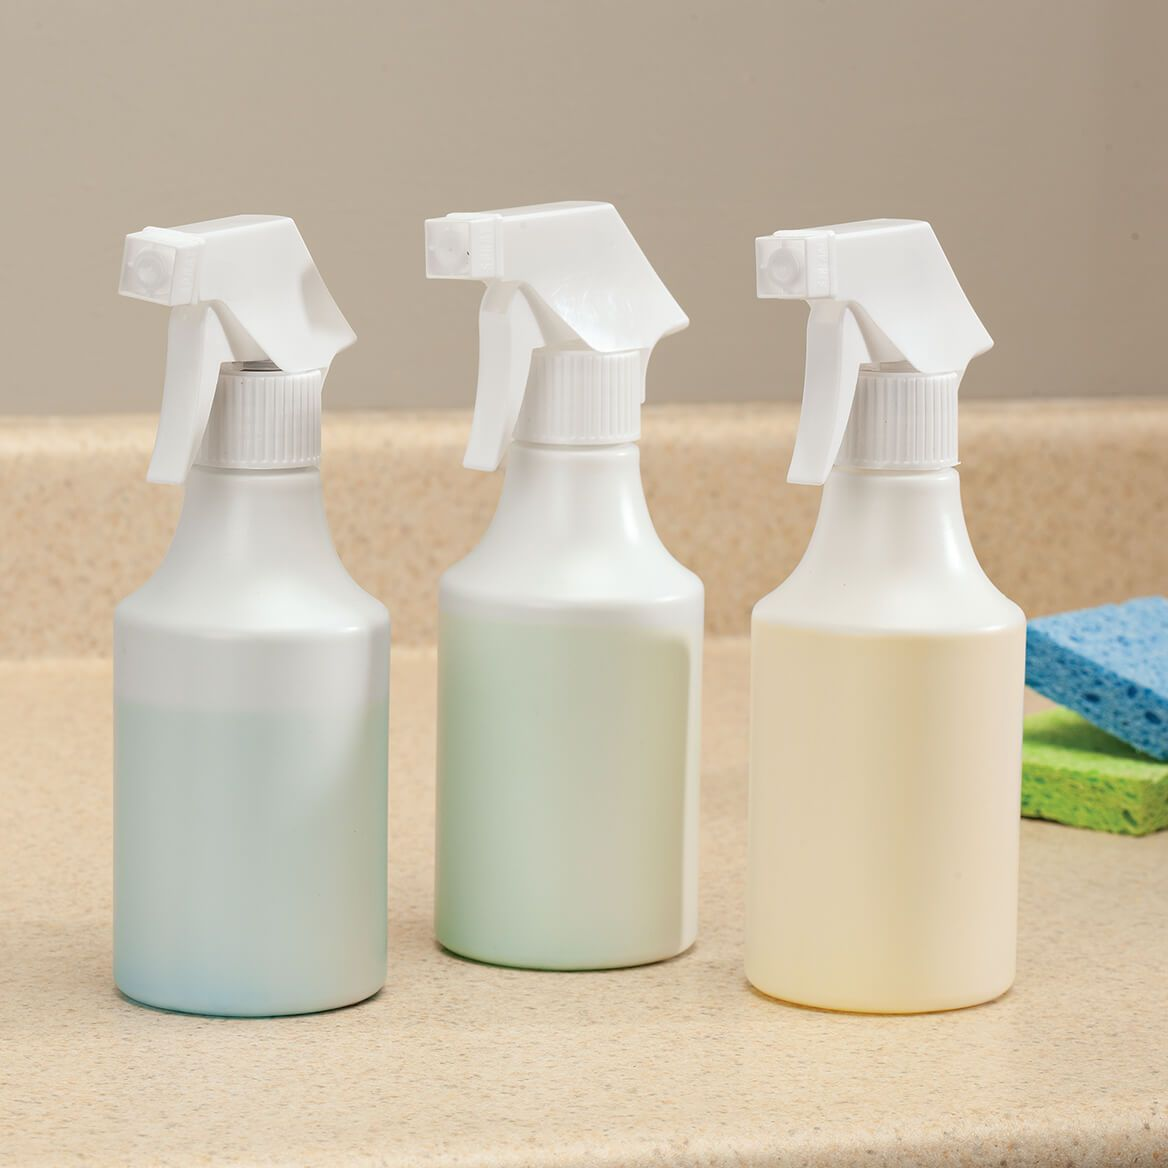 10oz. All Purpose Spray Bottles Set of 3-370876